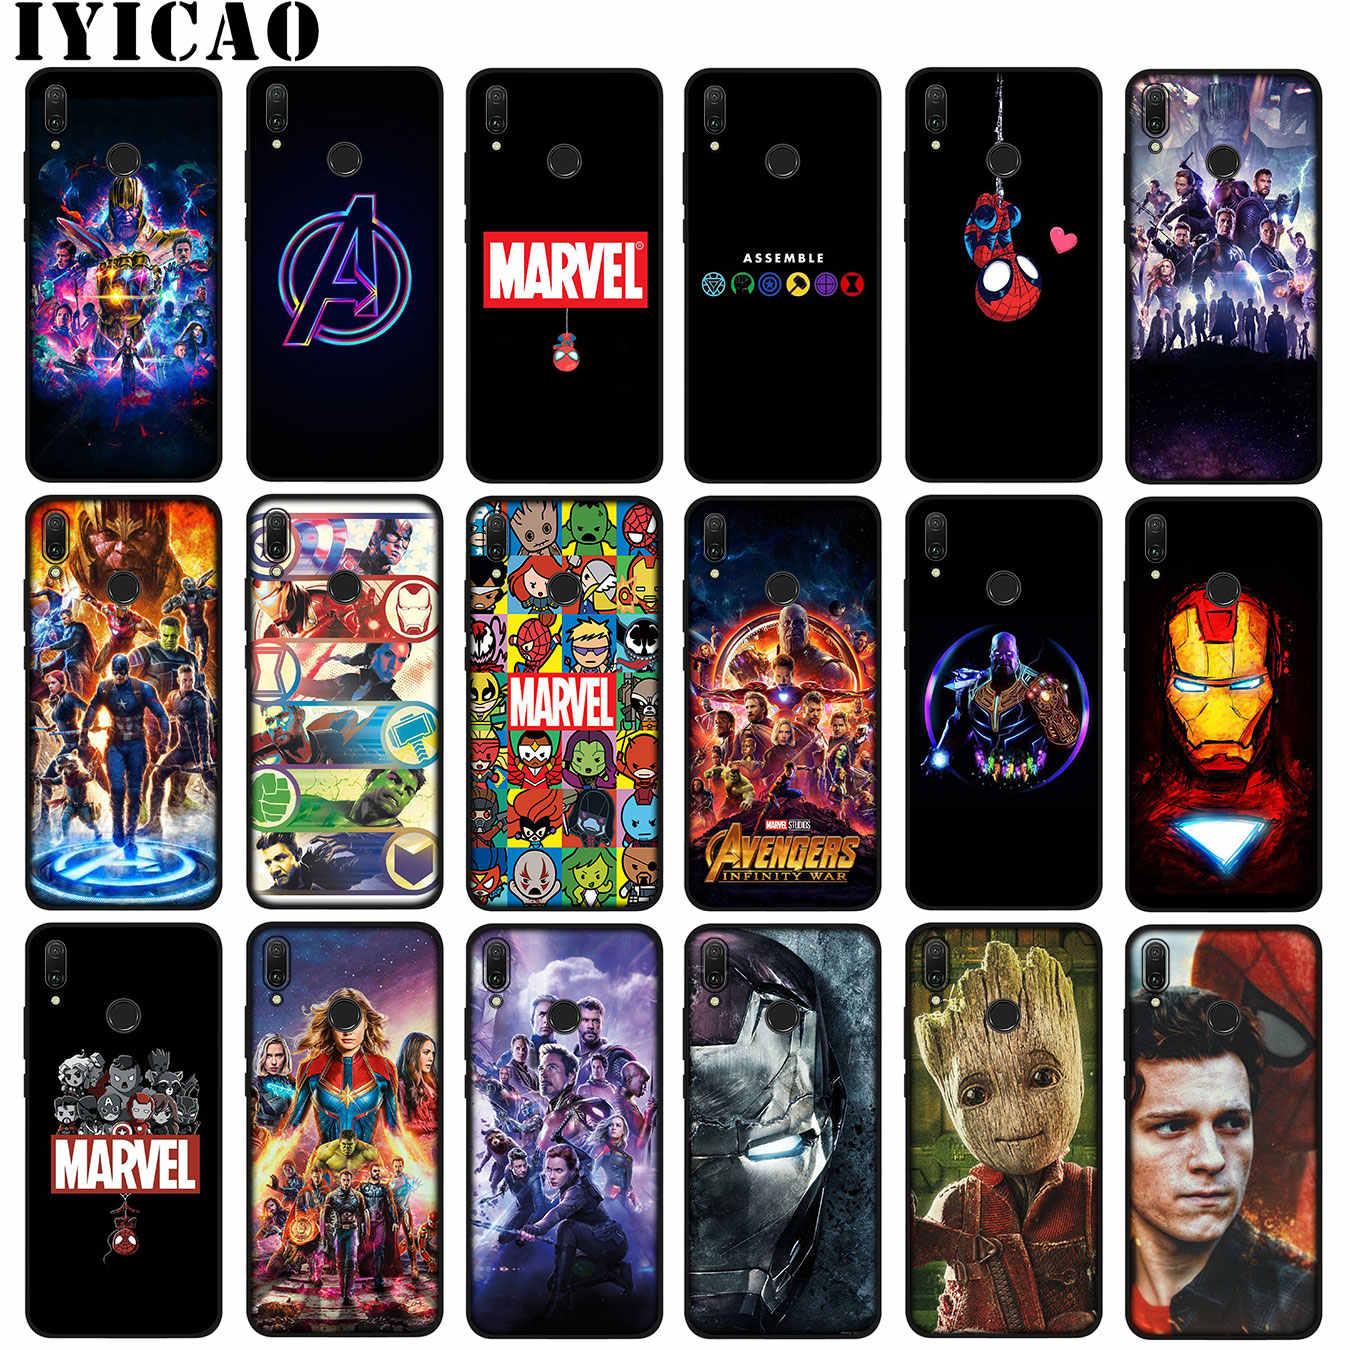 Avengers Endgame Marvel Spider Iron Man Thanos Soft Case for Huawei P30 P20 Pro P10 P9 Lite Mini P Smart Z 2019 Tom Holland